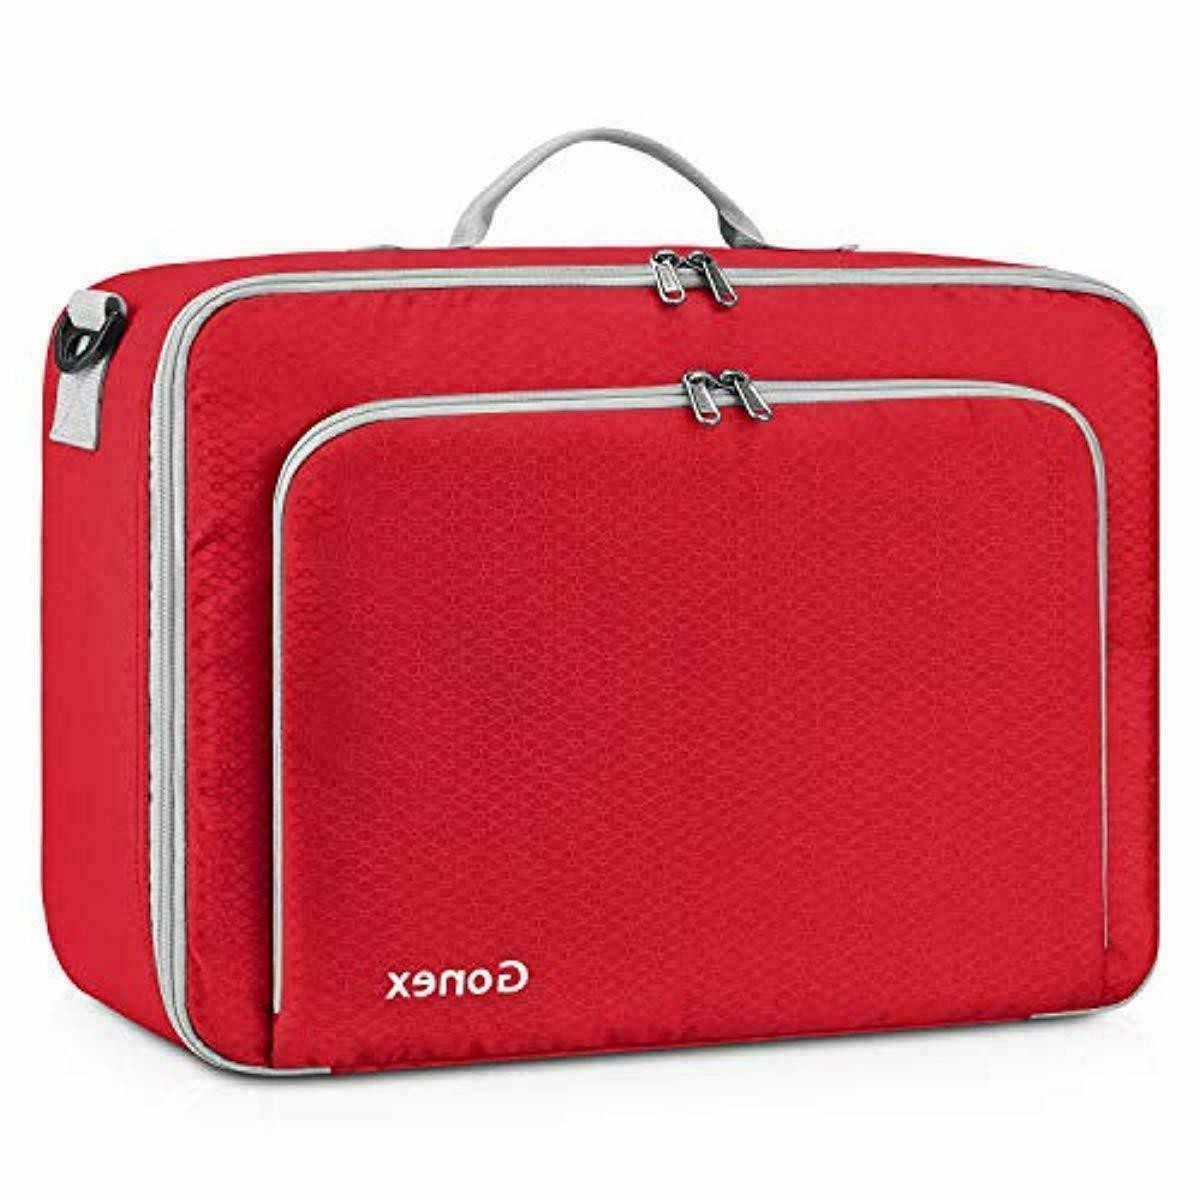 Gonex 20L Luggage - Red or Blue